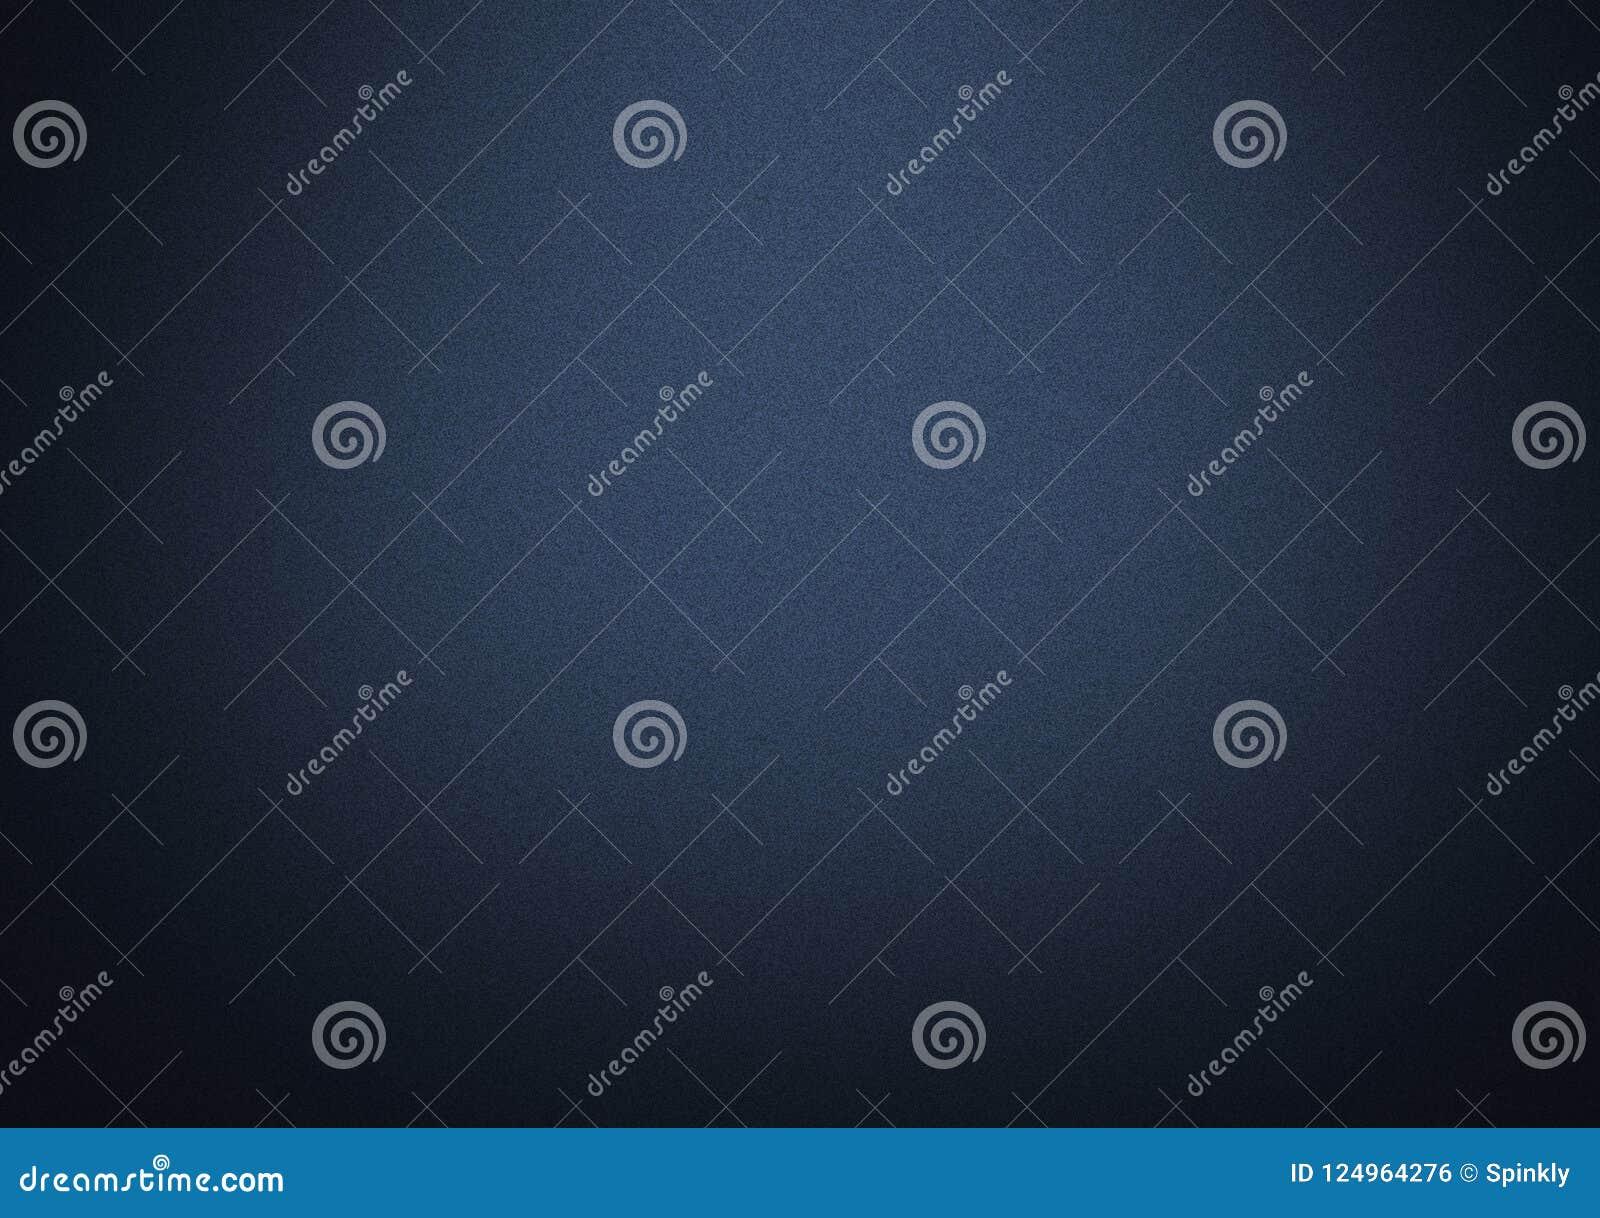 Navy Blue Plain Textured Background